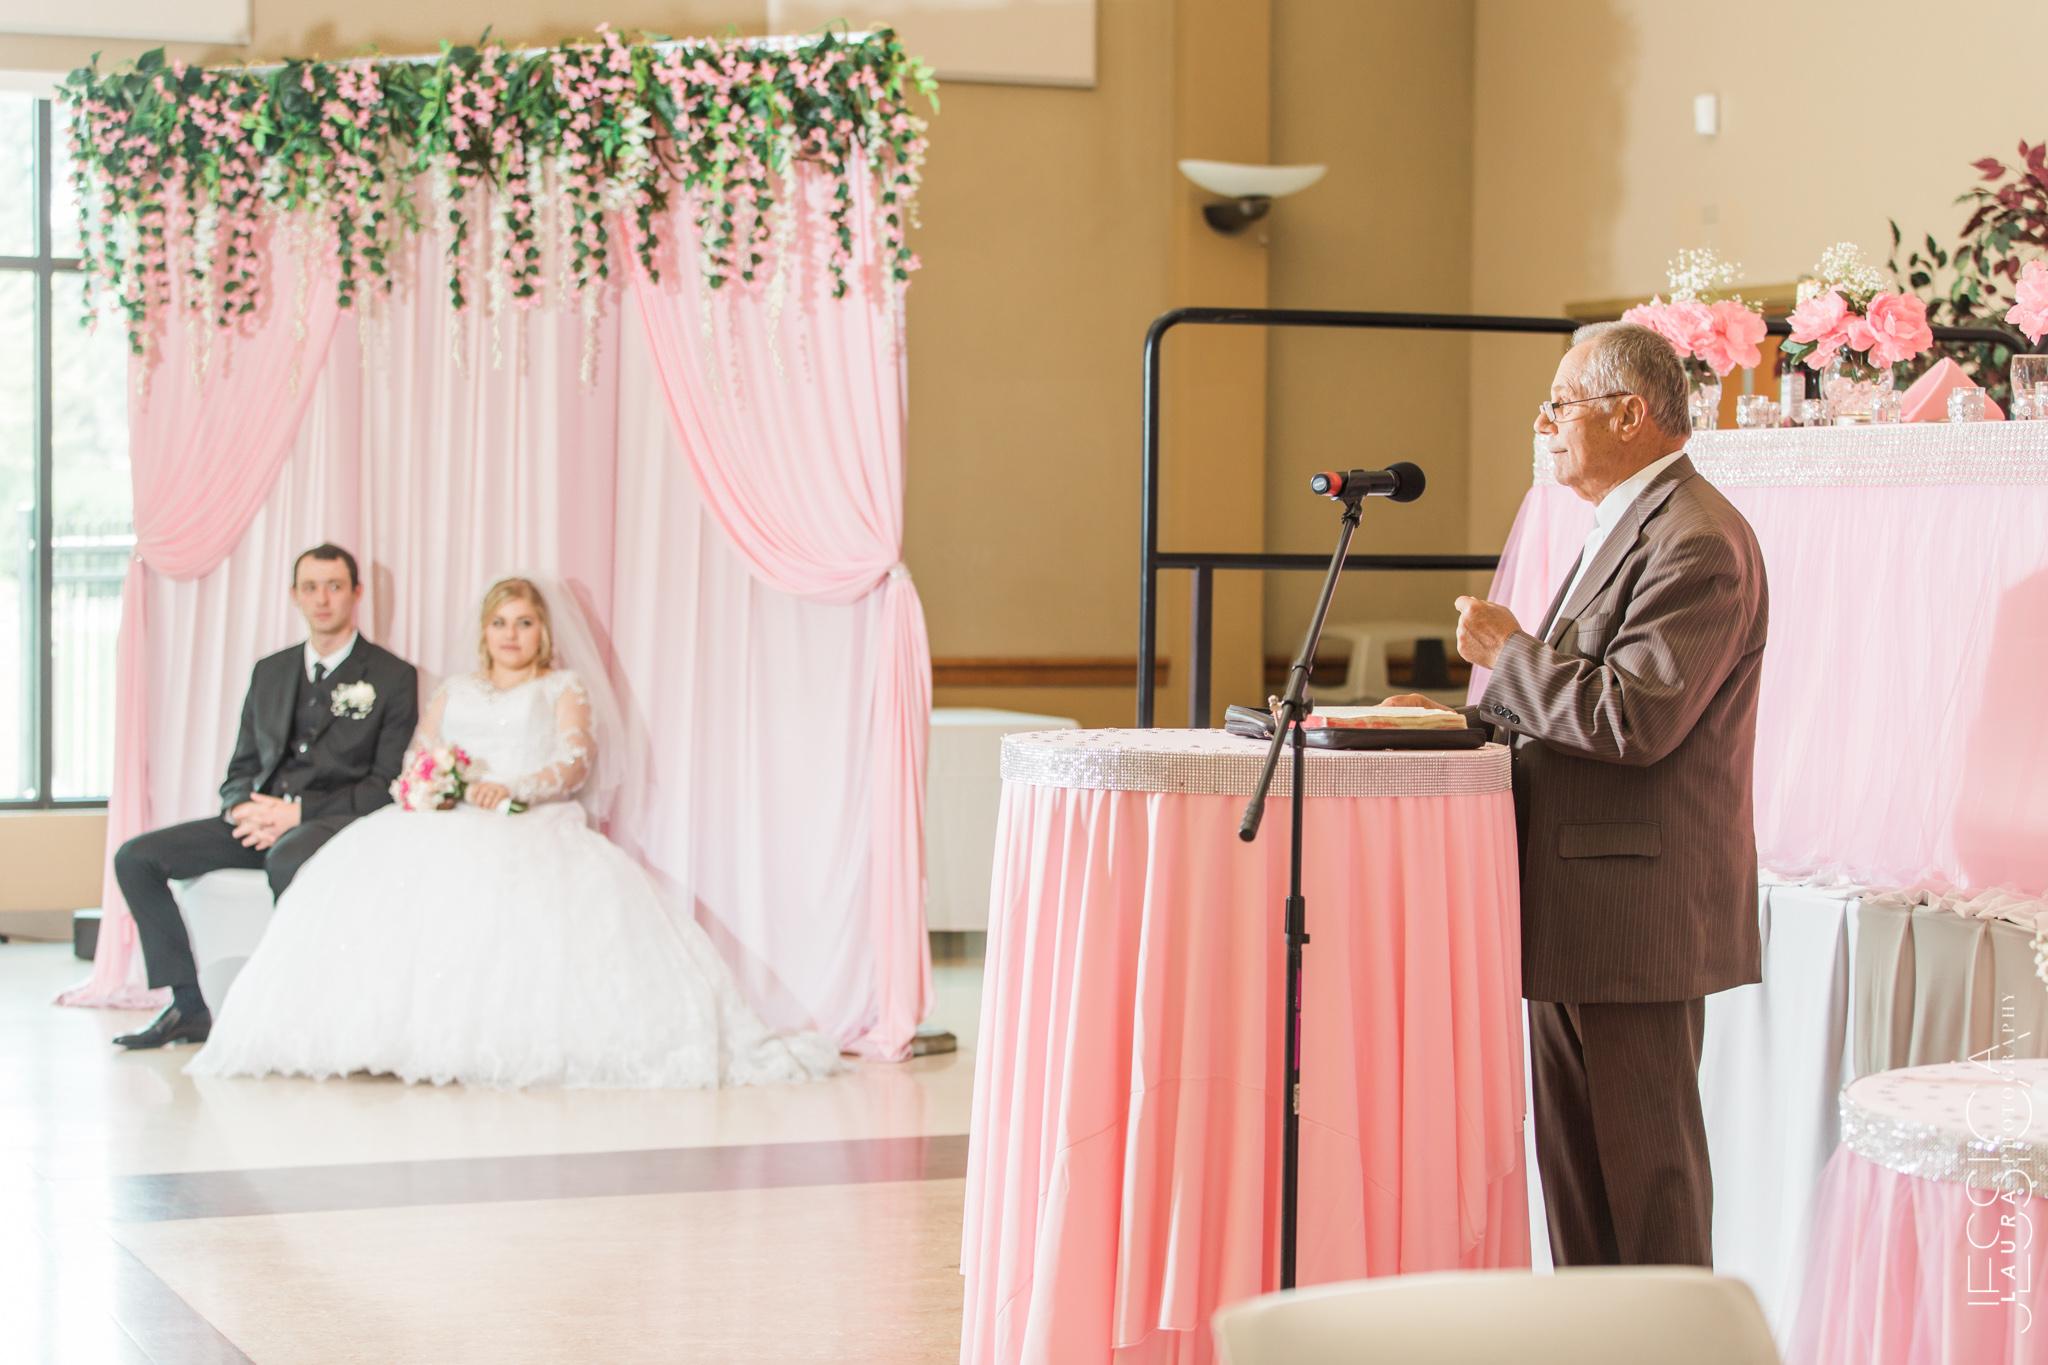 Eugene-Maryana_wedding_08062017_web (316 of 558).JPG